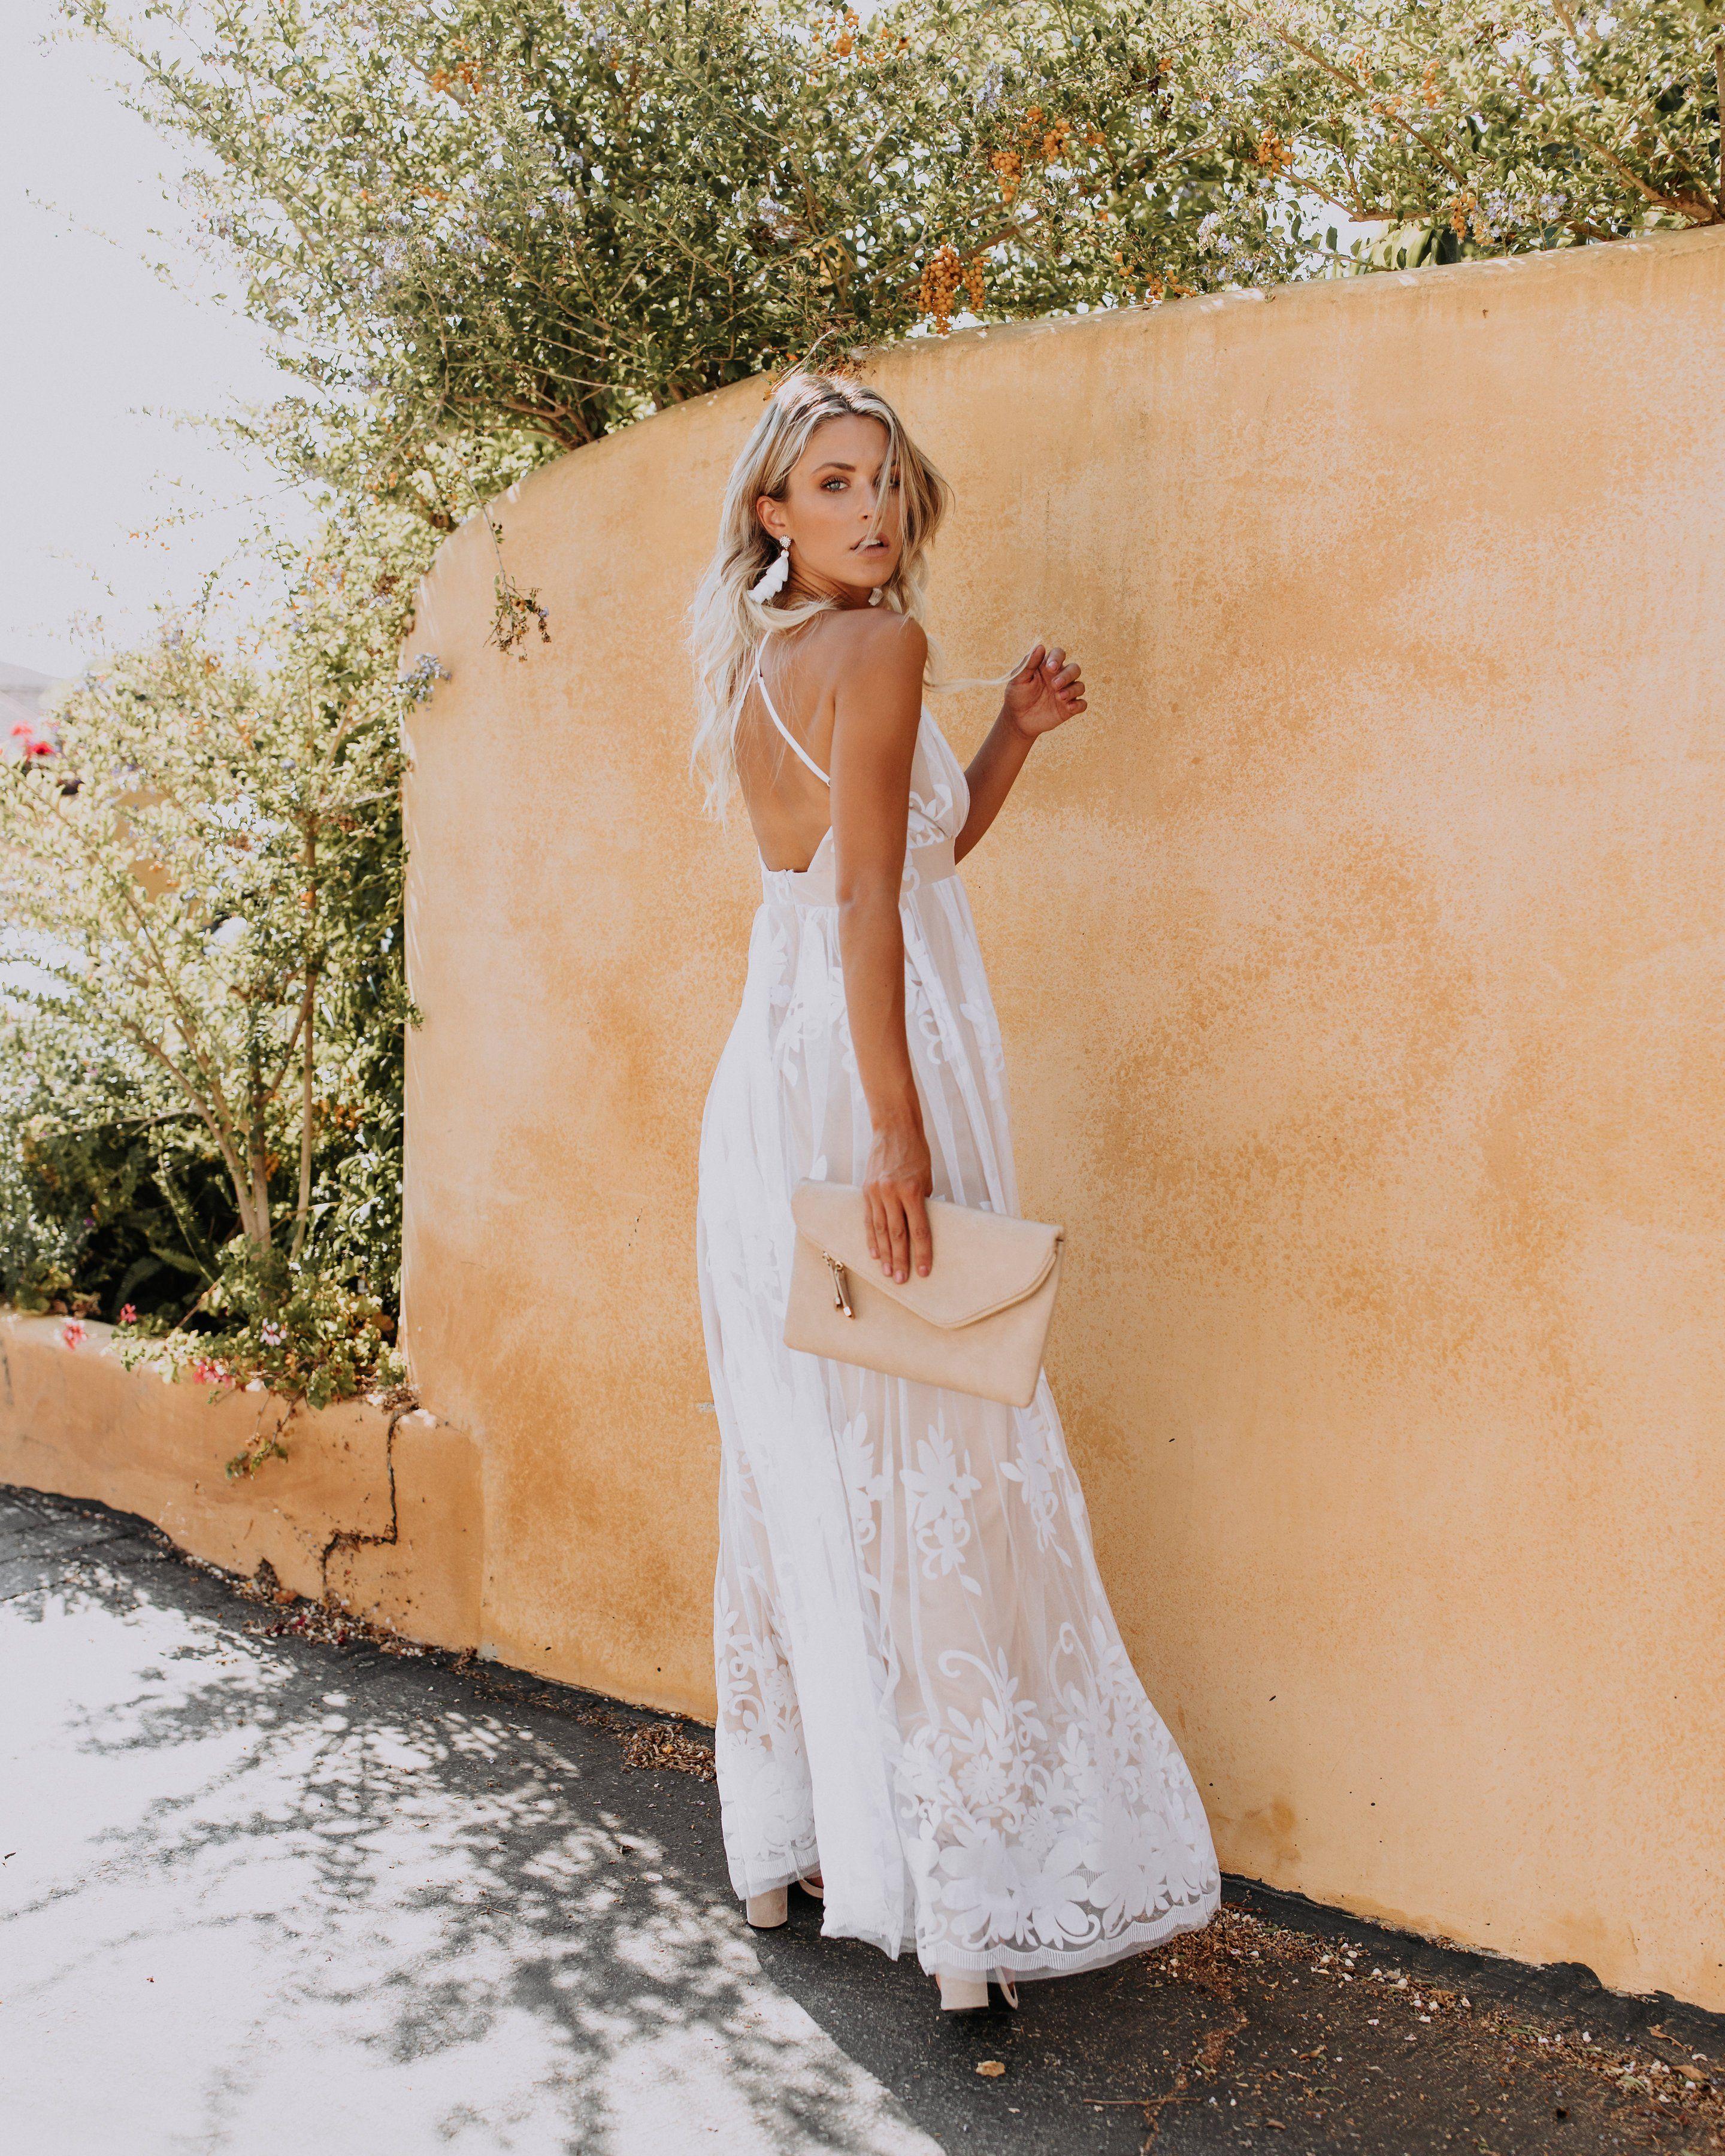 ce46b6b0ca3 PREORDER - Antonia Maxi Dress - White